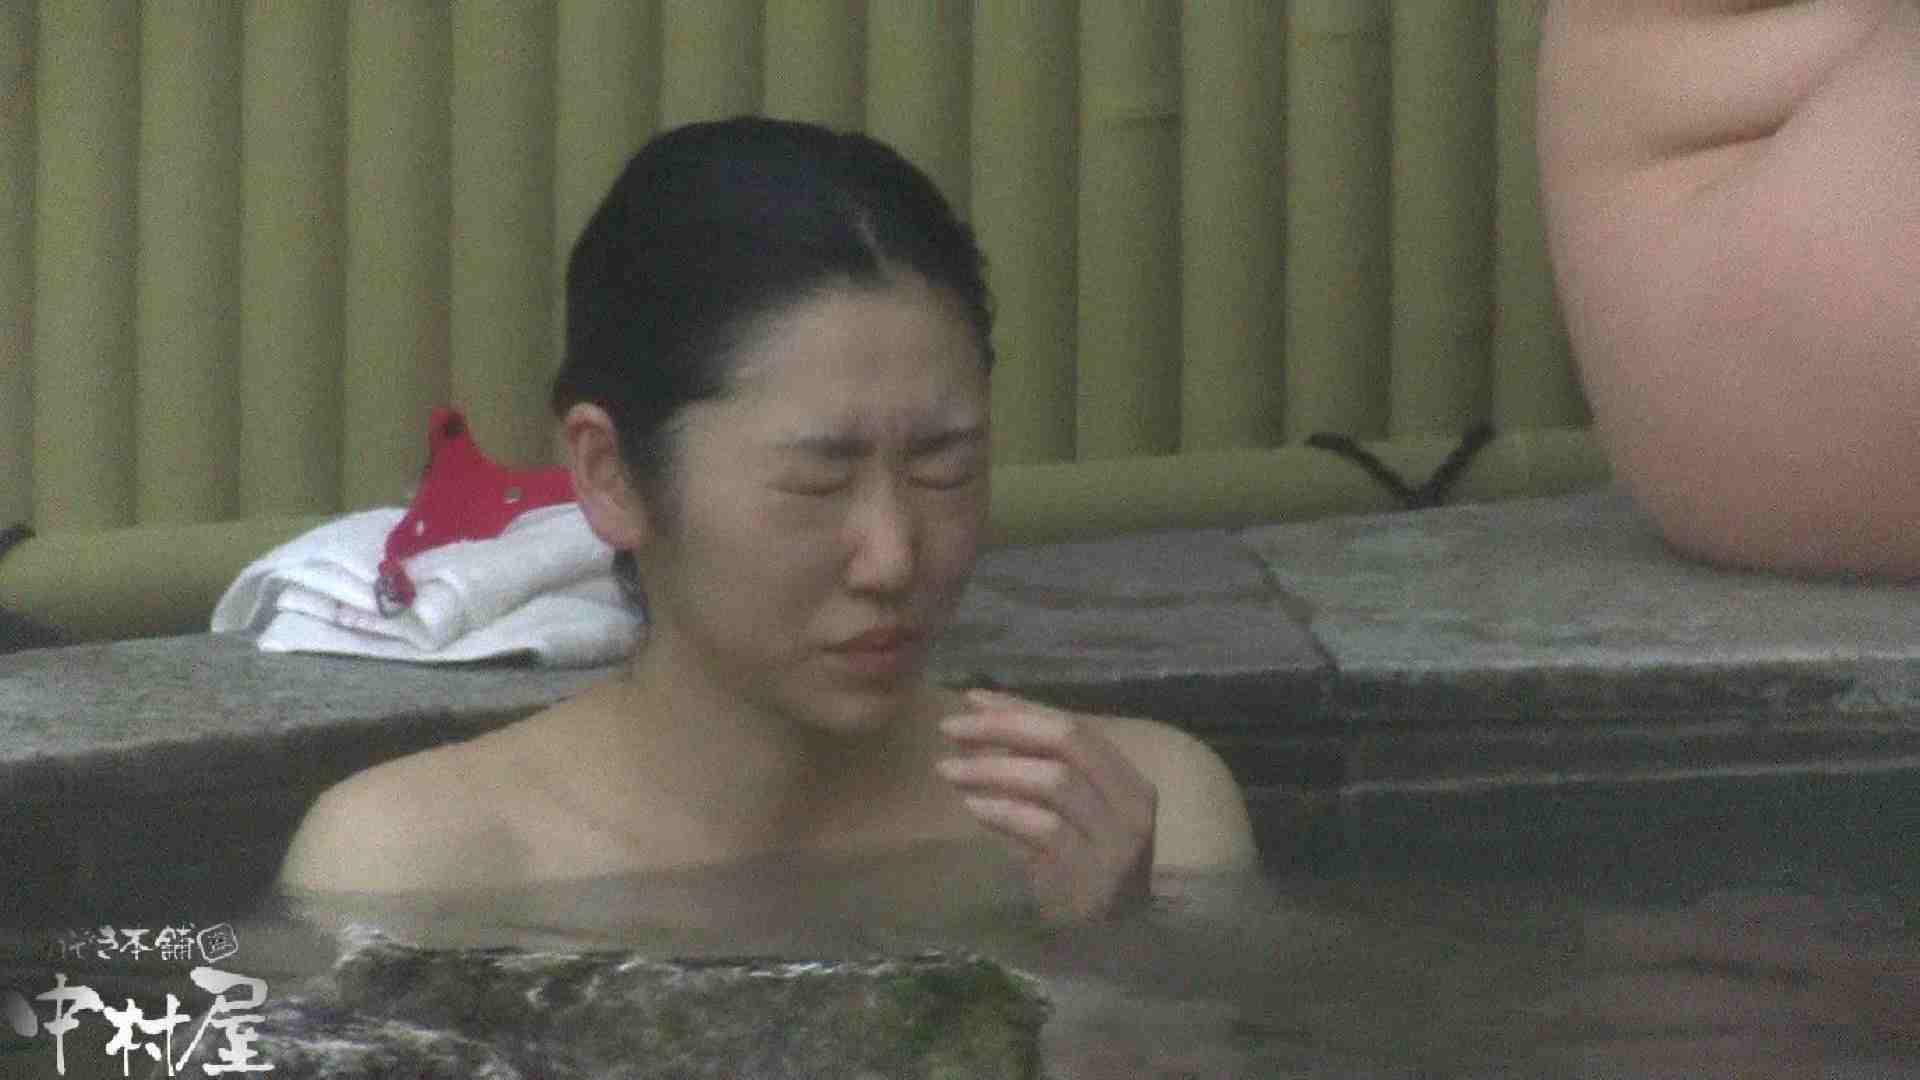 Aquaな露天風呂Vol.917 OLセックス   盗撮  102画像 40